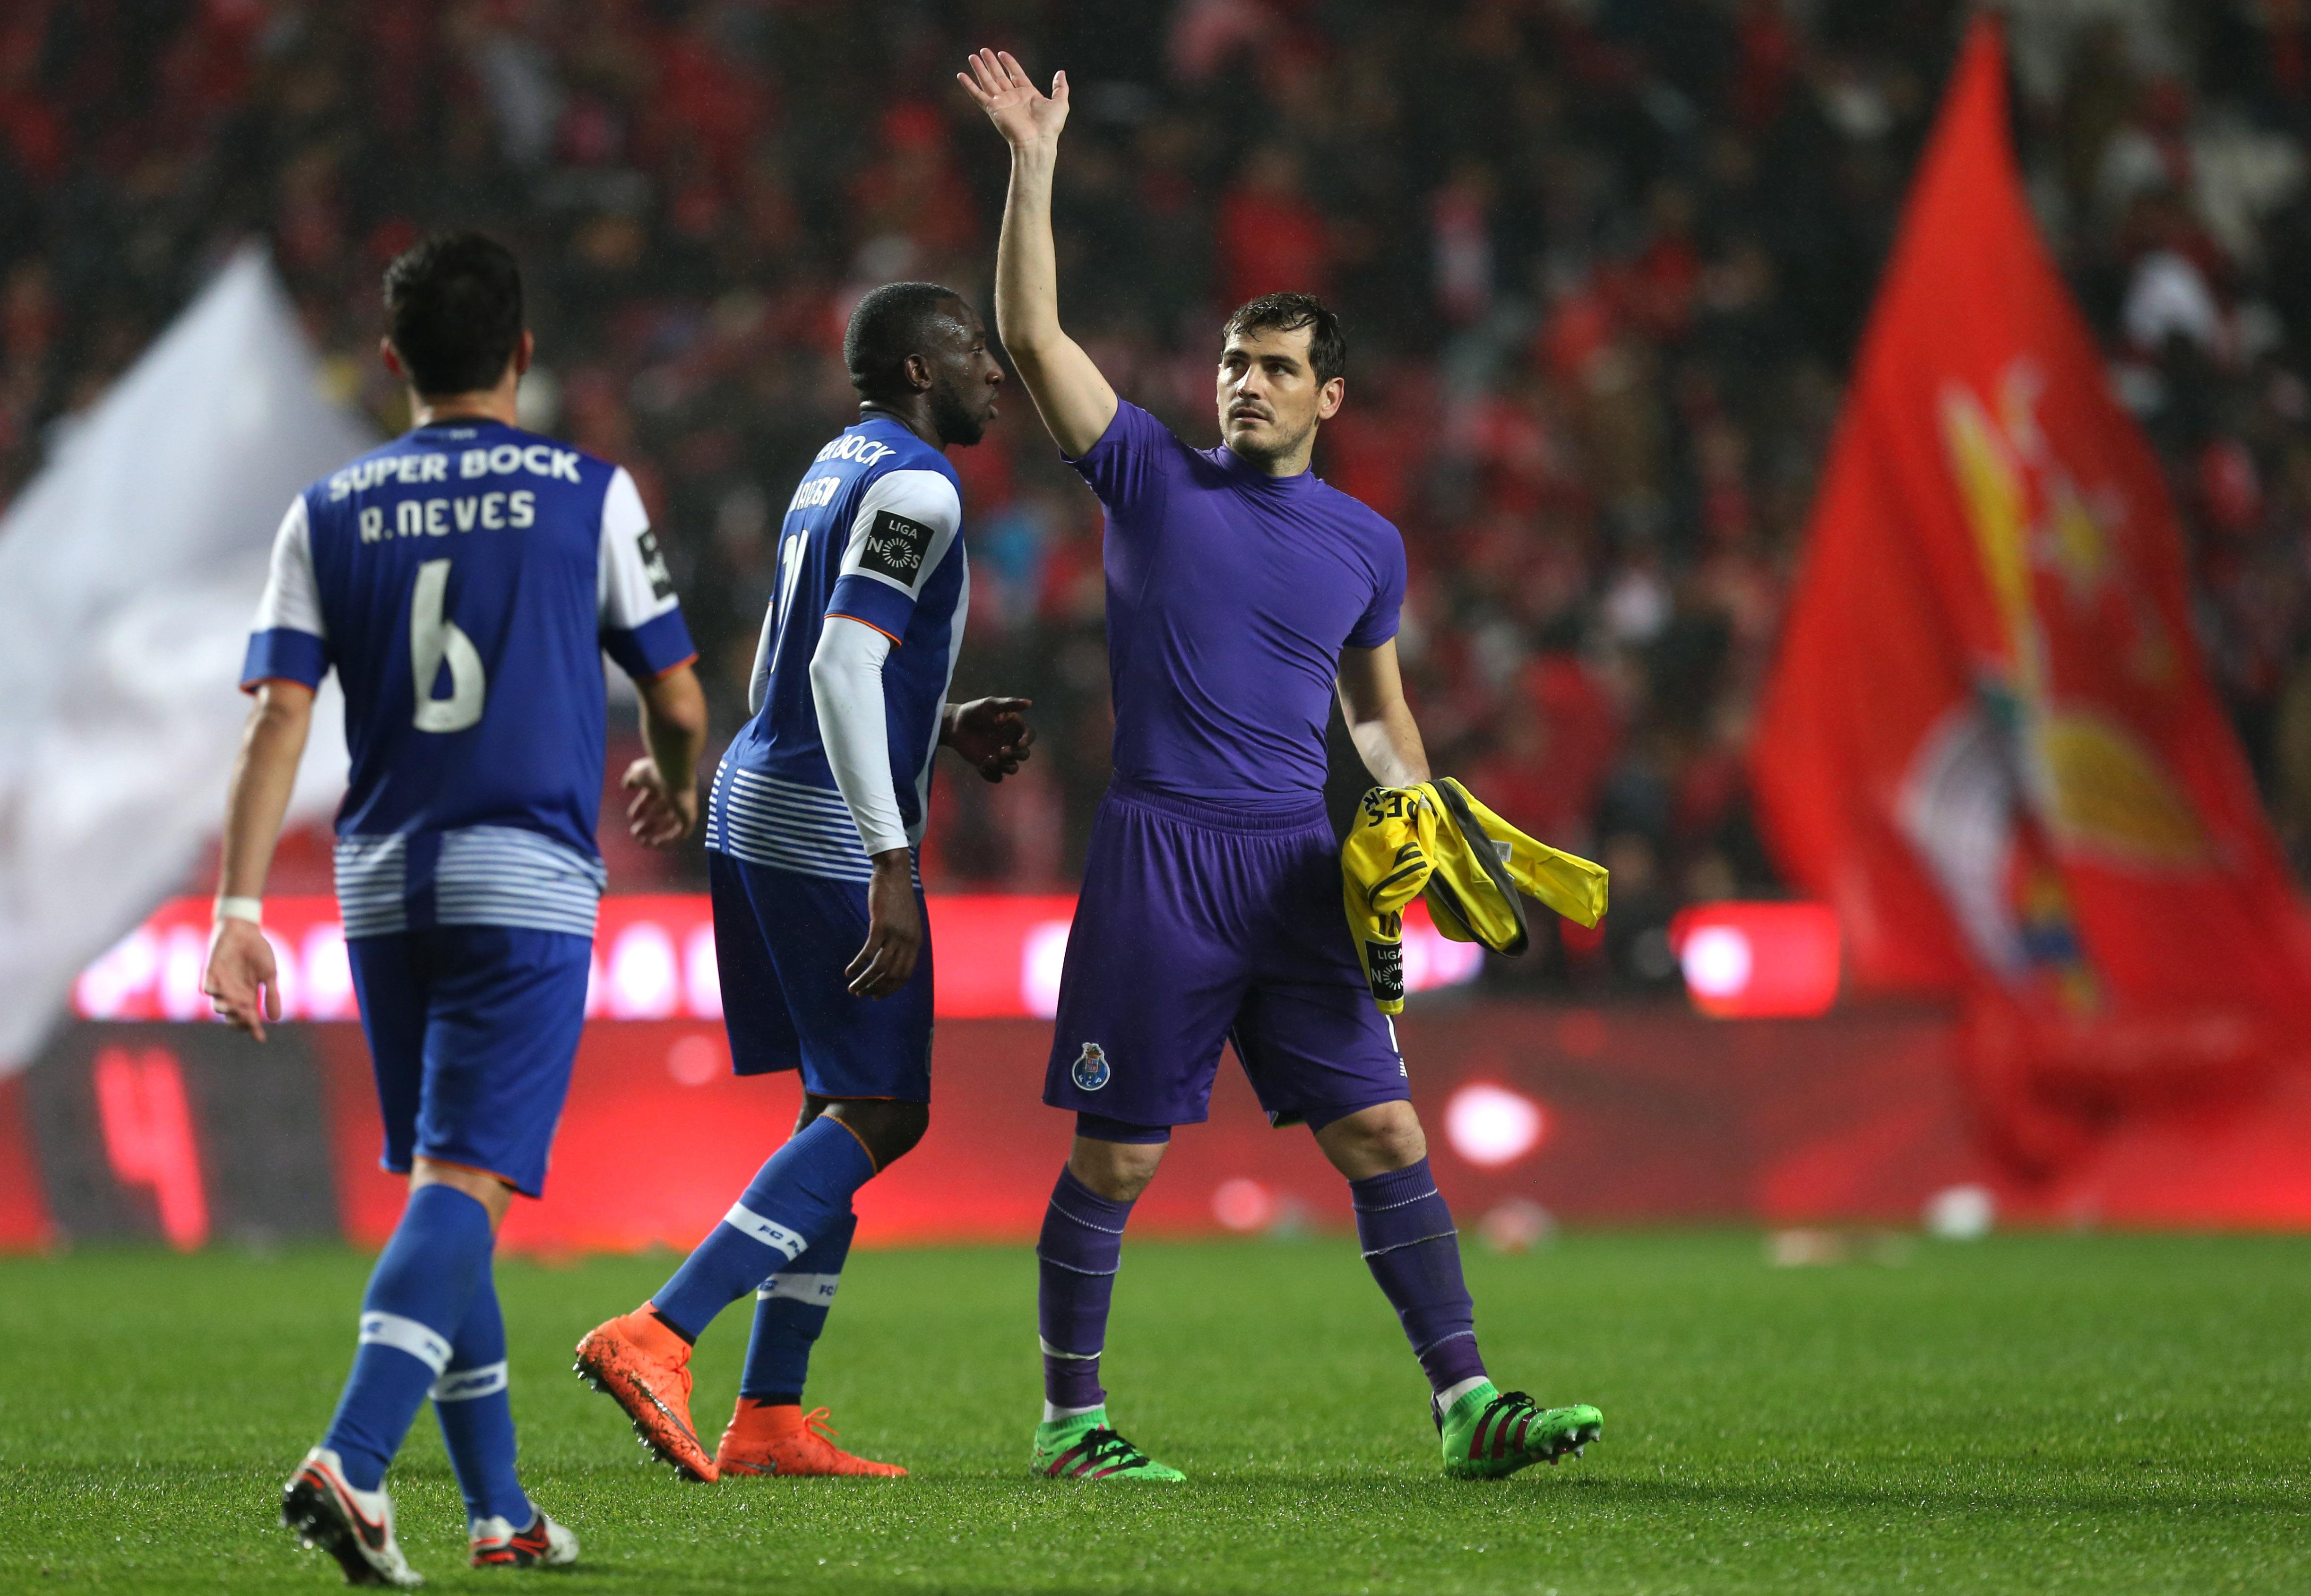 portugal_soccer-be131178d214420c8c9150a6_r380.jpeg